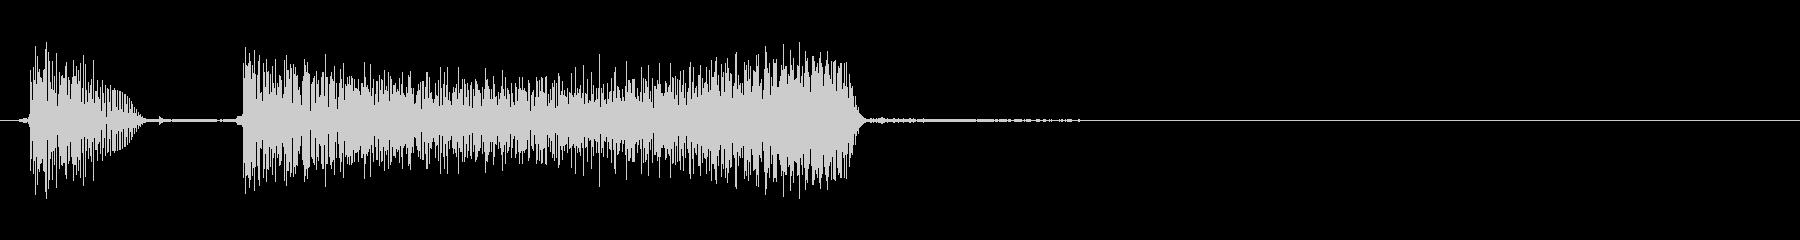 STEEL GUITAR:UH O...の未再生の波形